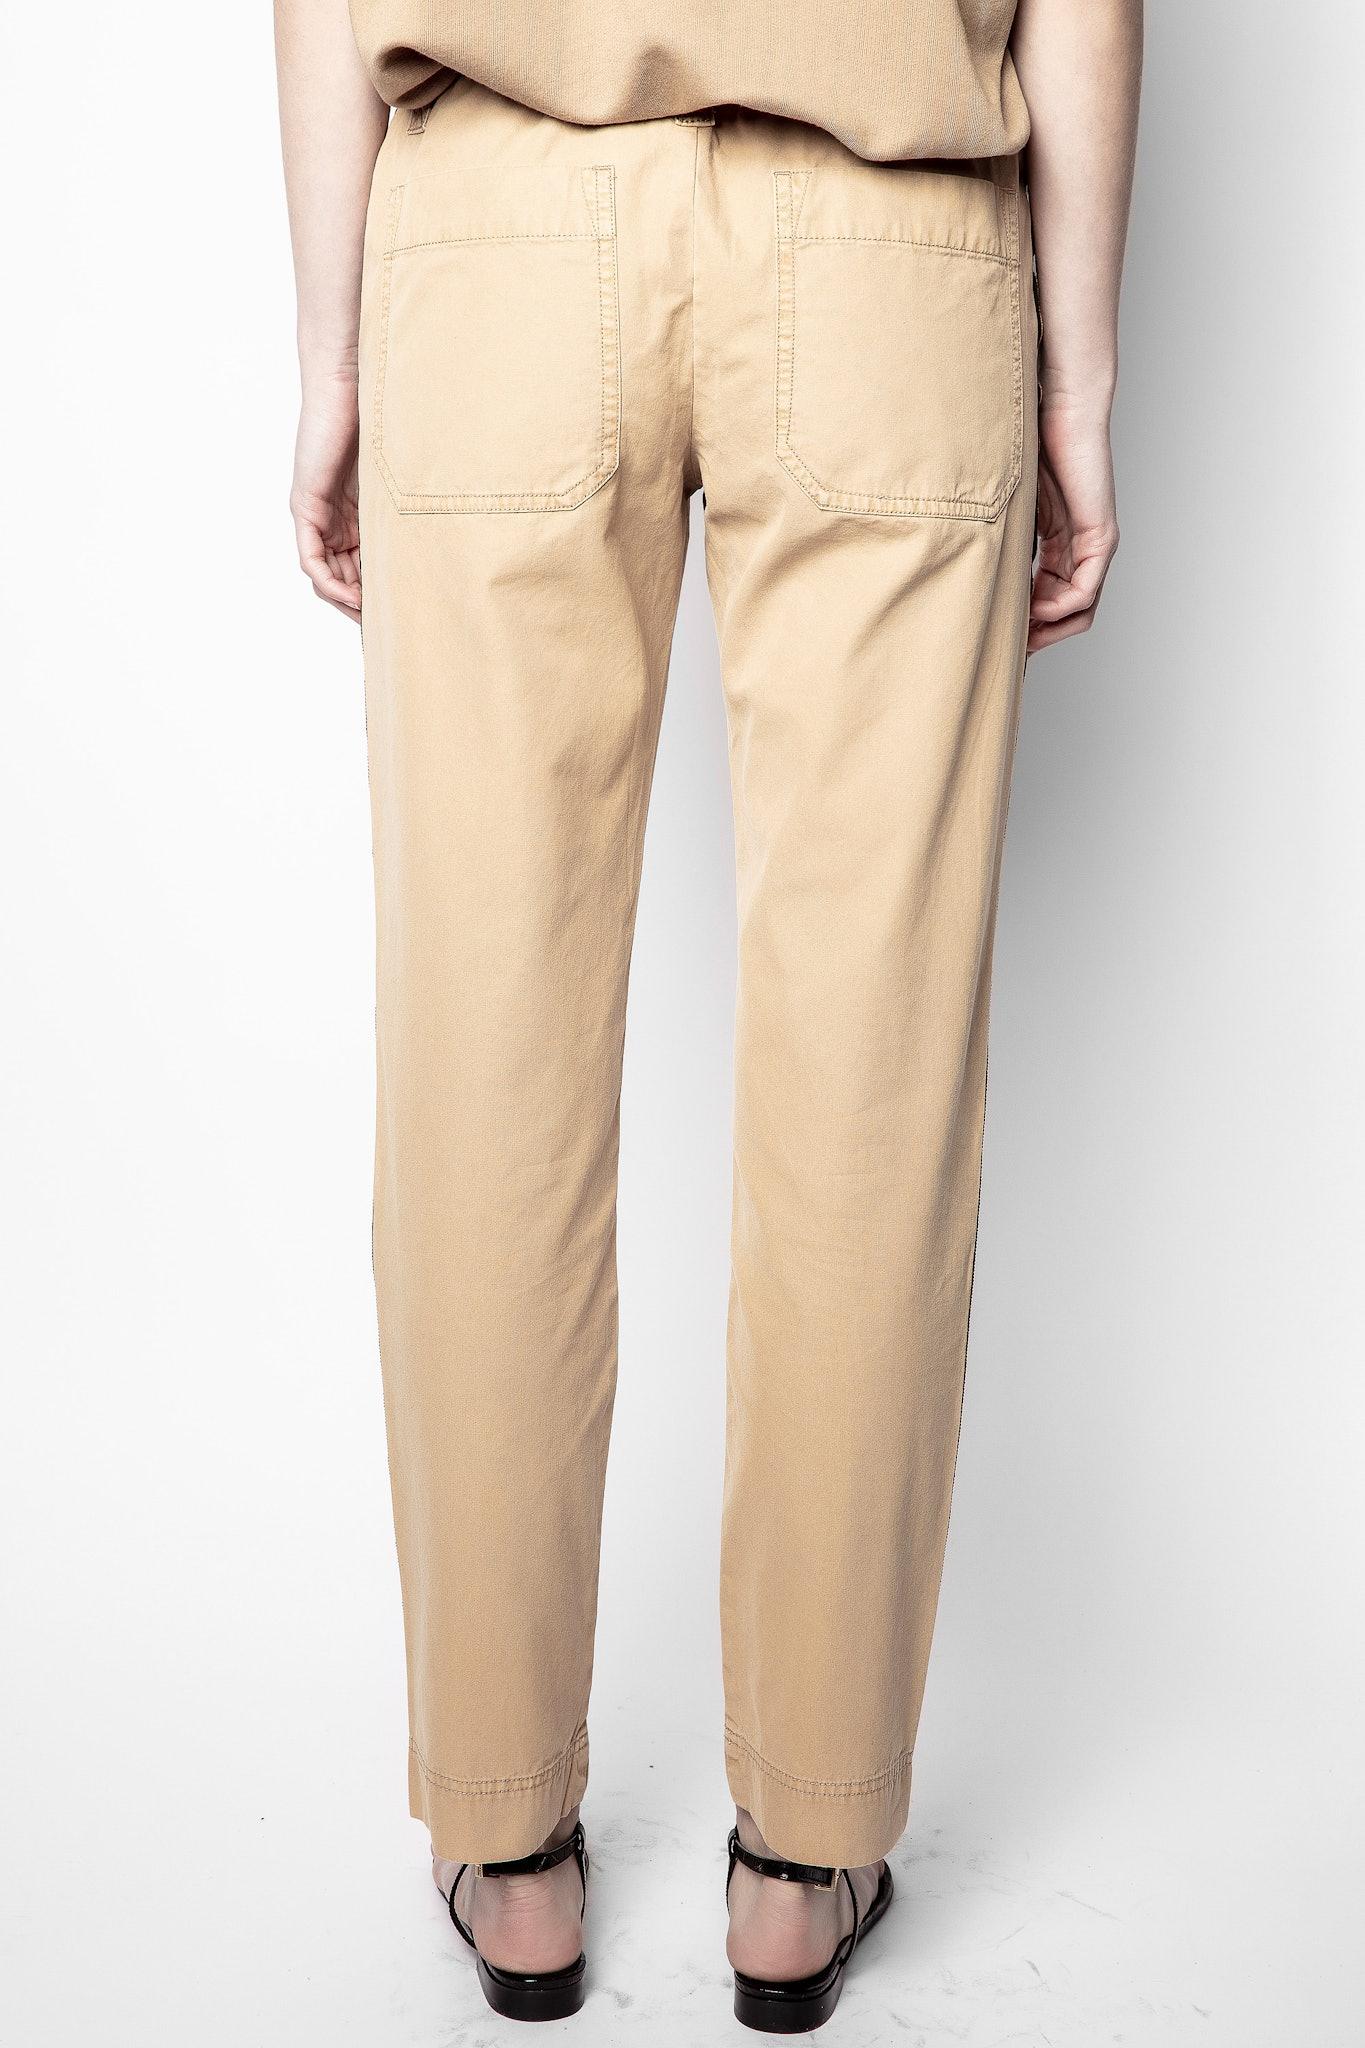 Pomelo Pants